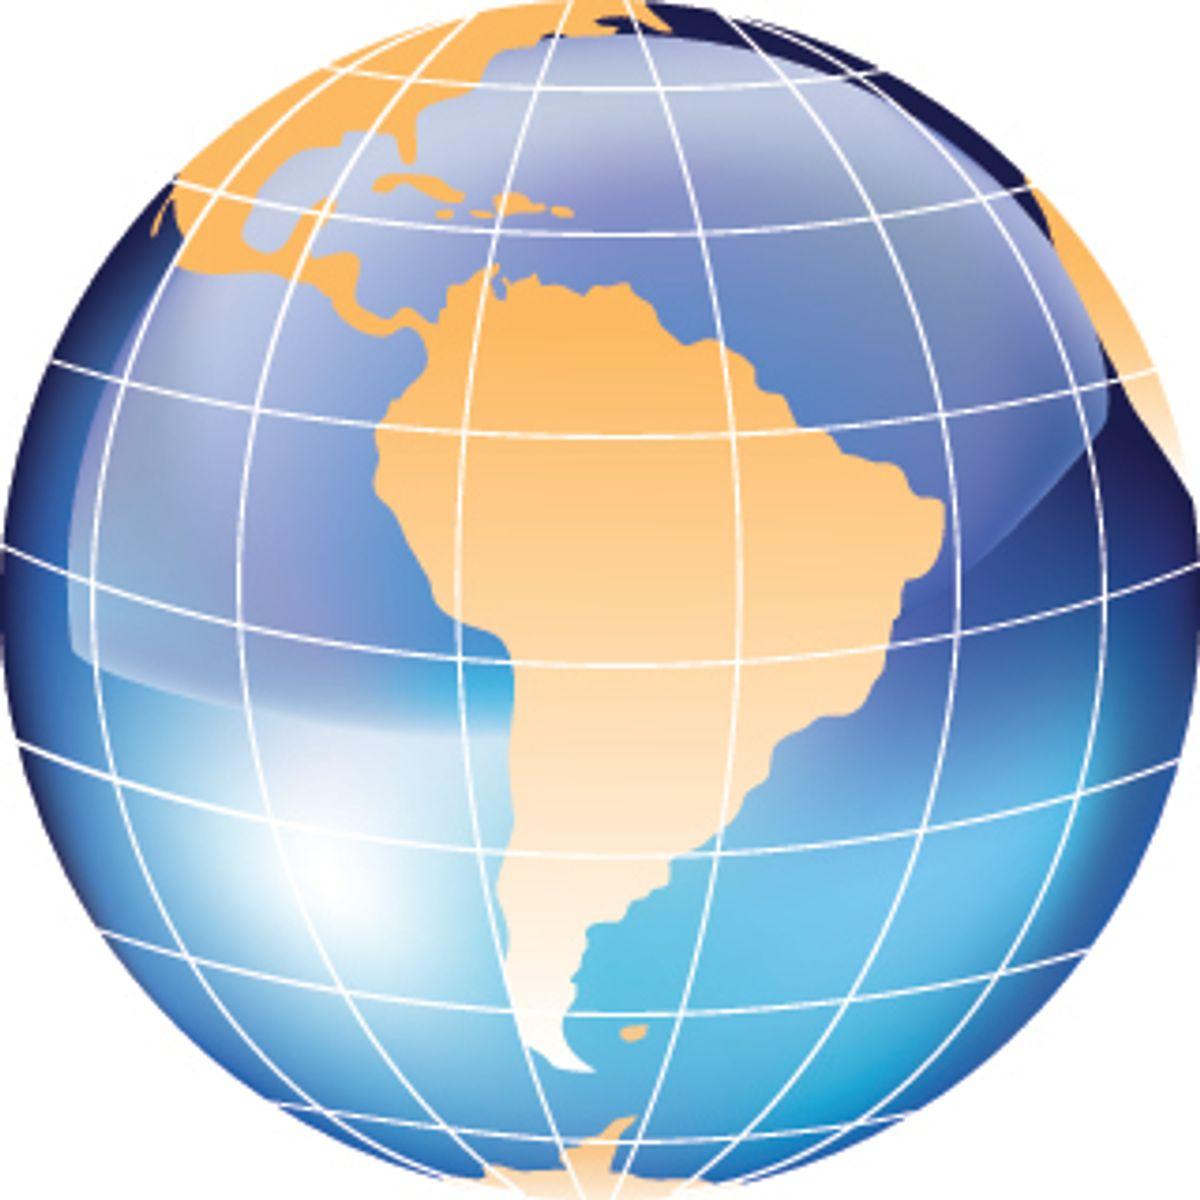 Penske Logistics Positioned to Serve Brazil's Growth